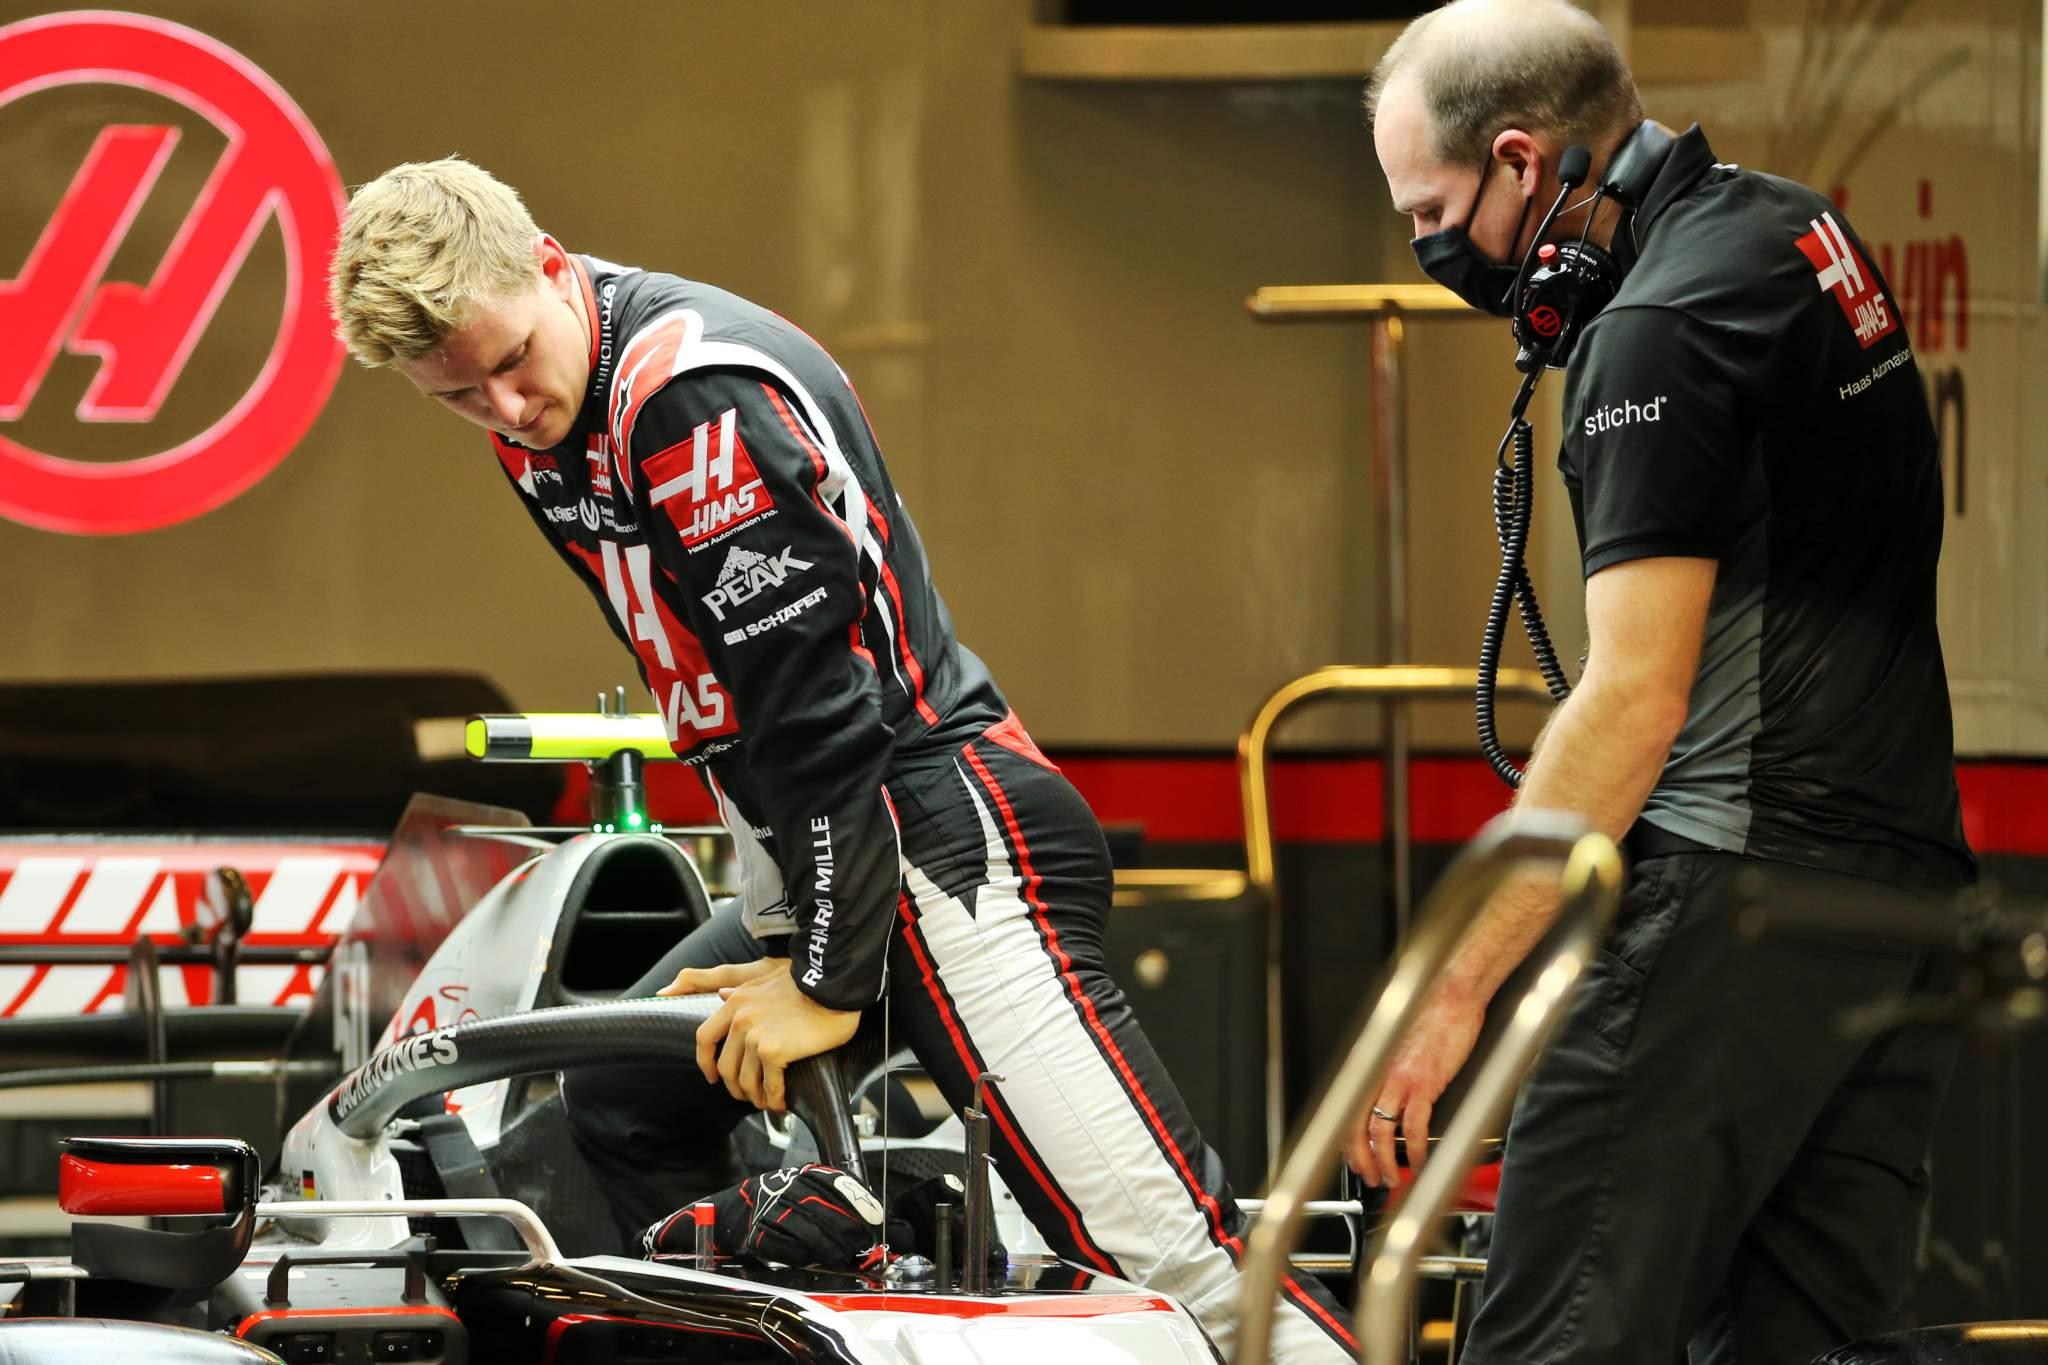 Motor Racing Formula One World Championship Abu Dhabi Grand Prix Preparation Day Abu Dhabi, Uae